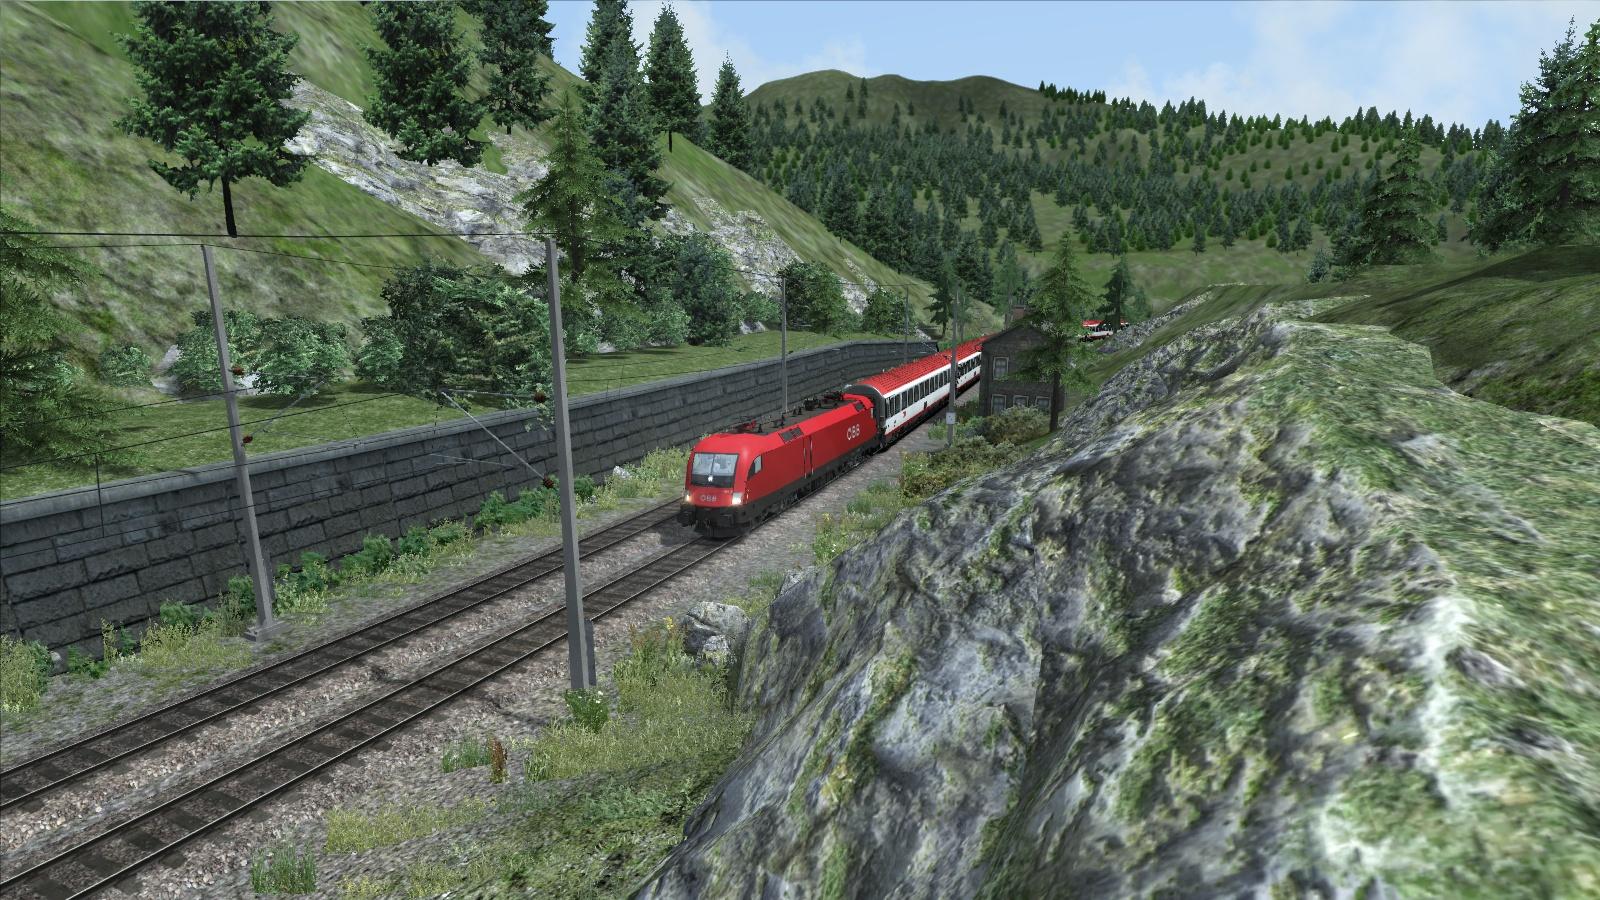 screenshot_semmeringbahn_47_66331-15_85920_12-51-13.jpg